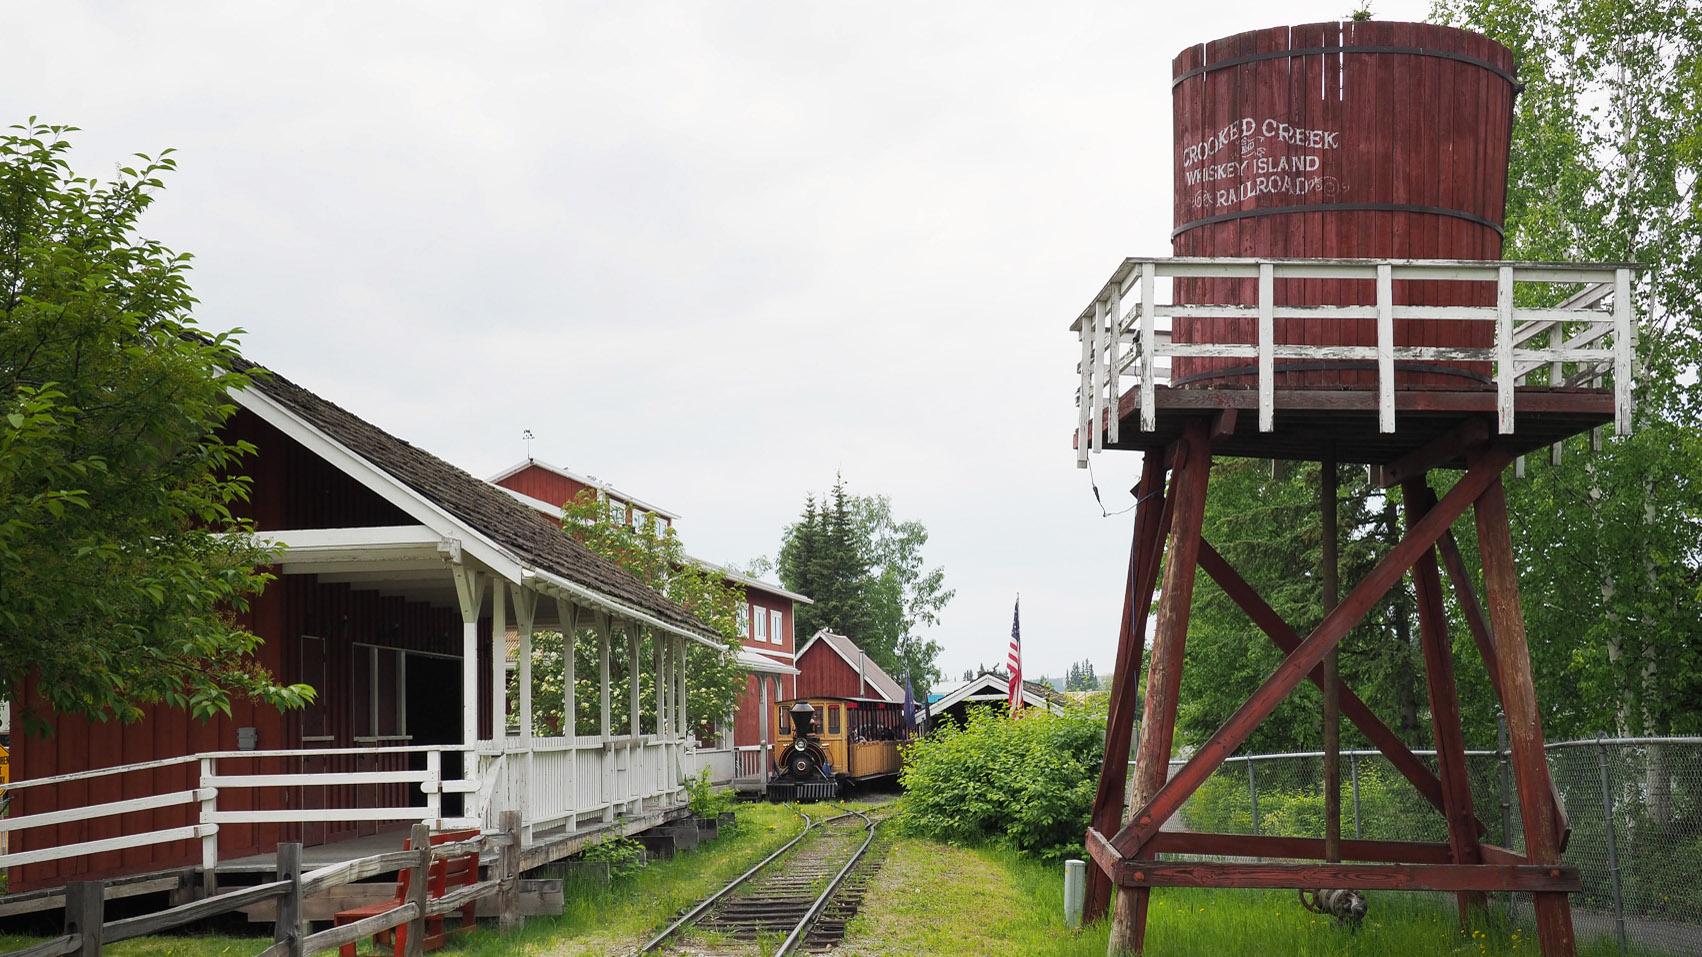 Fairbanks Pionier Park, aler Bahnhof und Lok